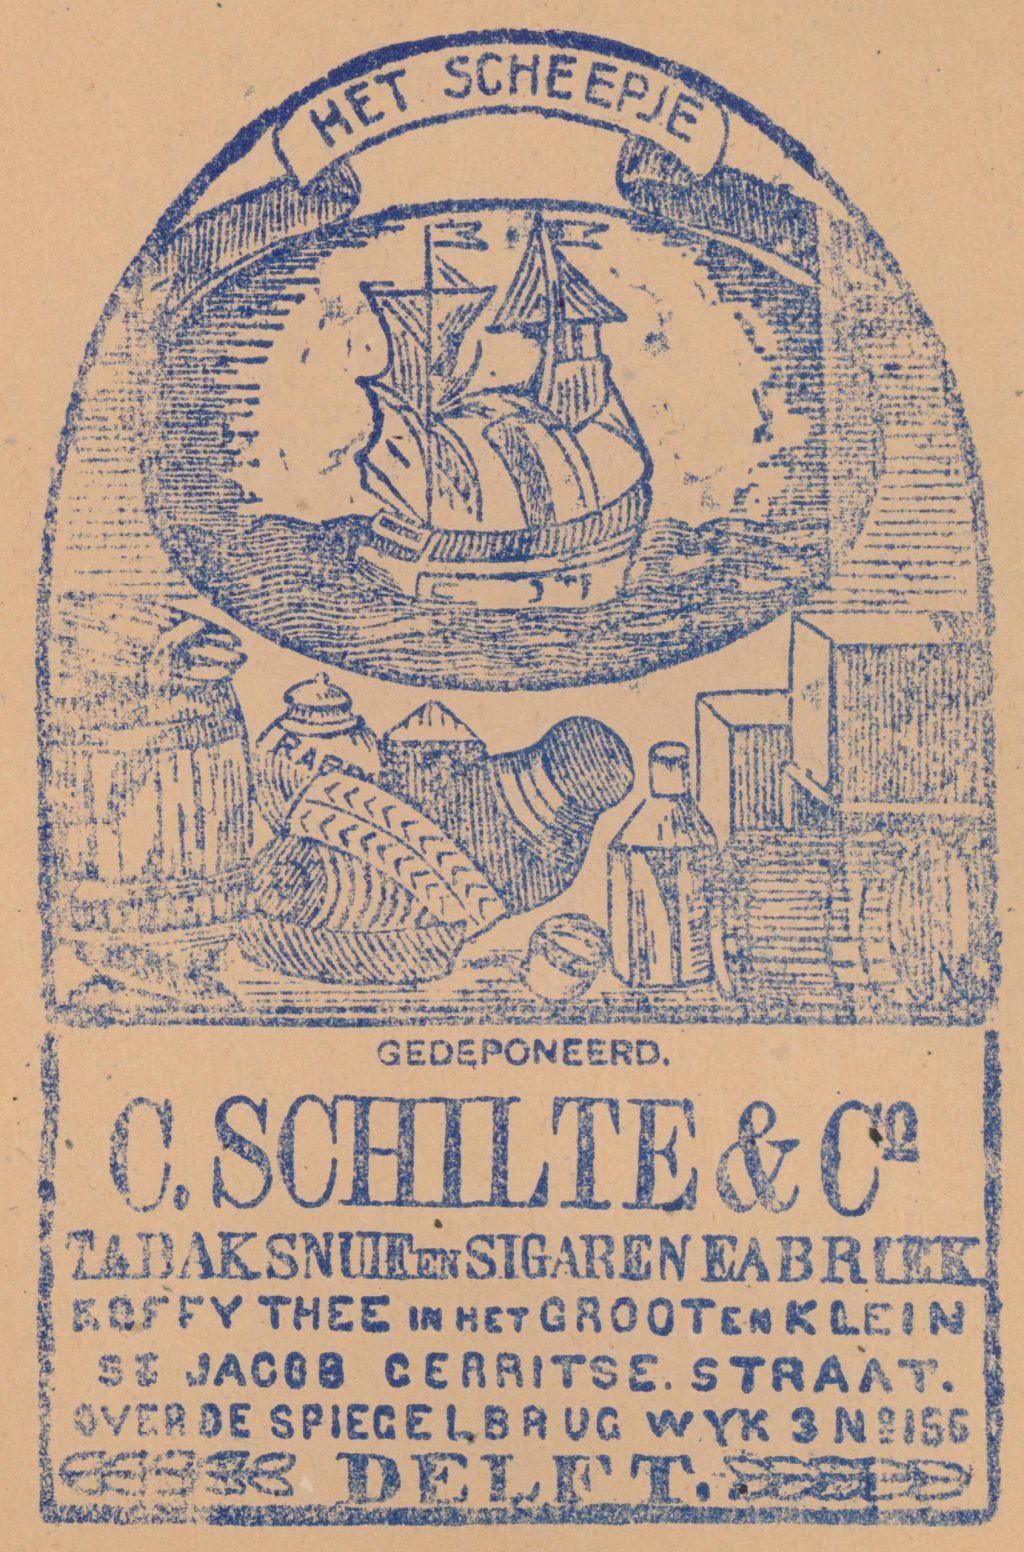 Reclame op tabakzakjes, 19e eeuw (TMS 61887)